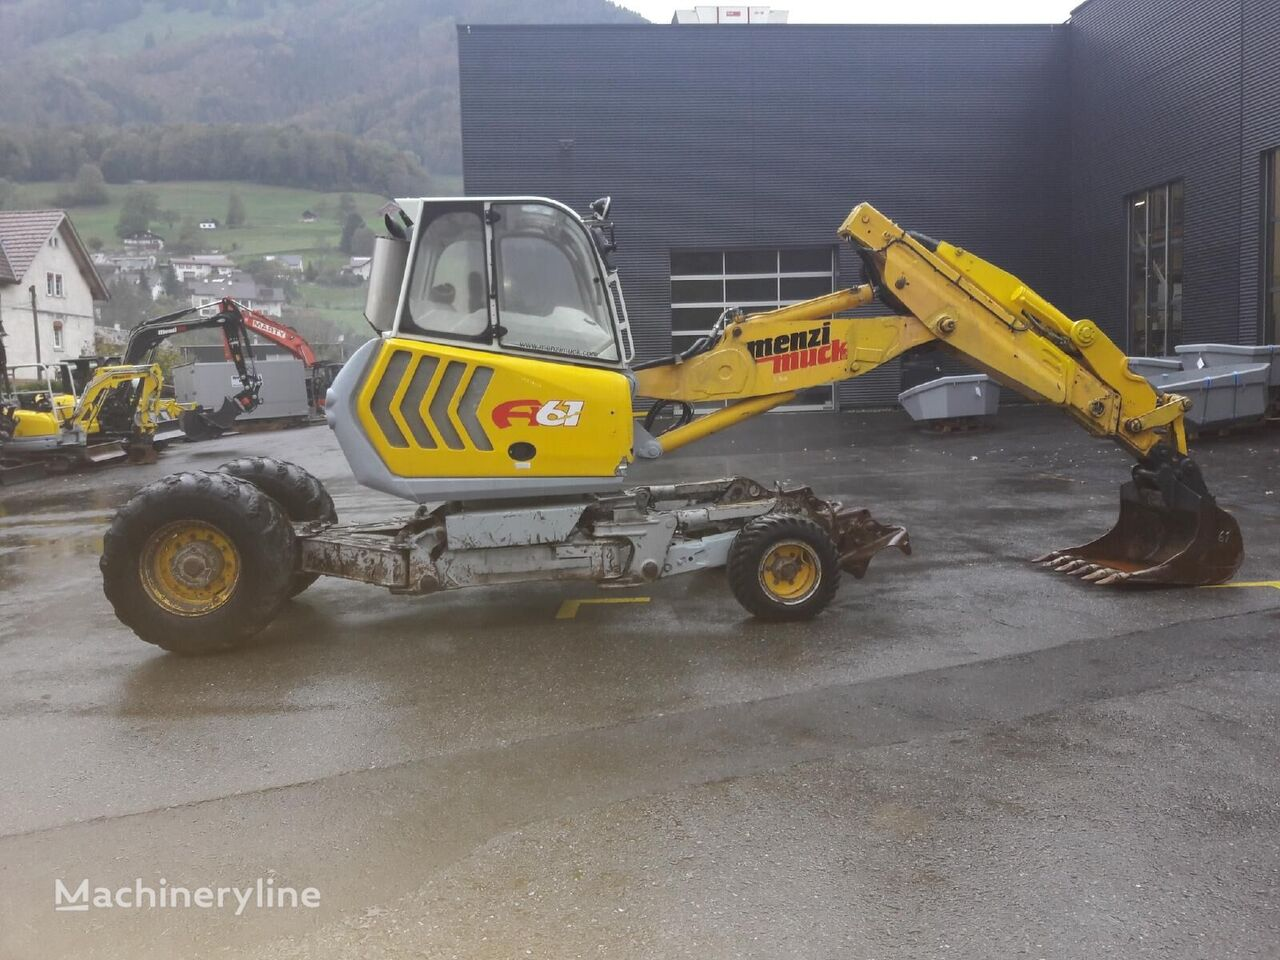 MENZI MUCK A61 Mobil walking excavator